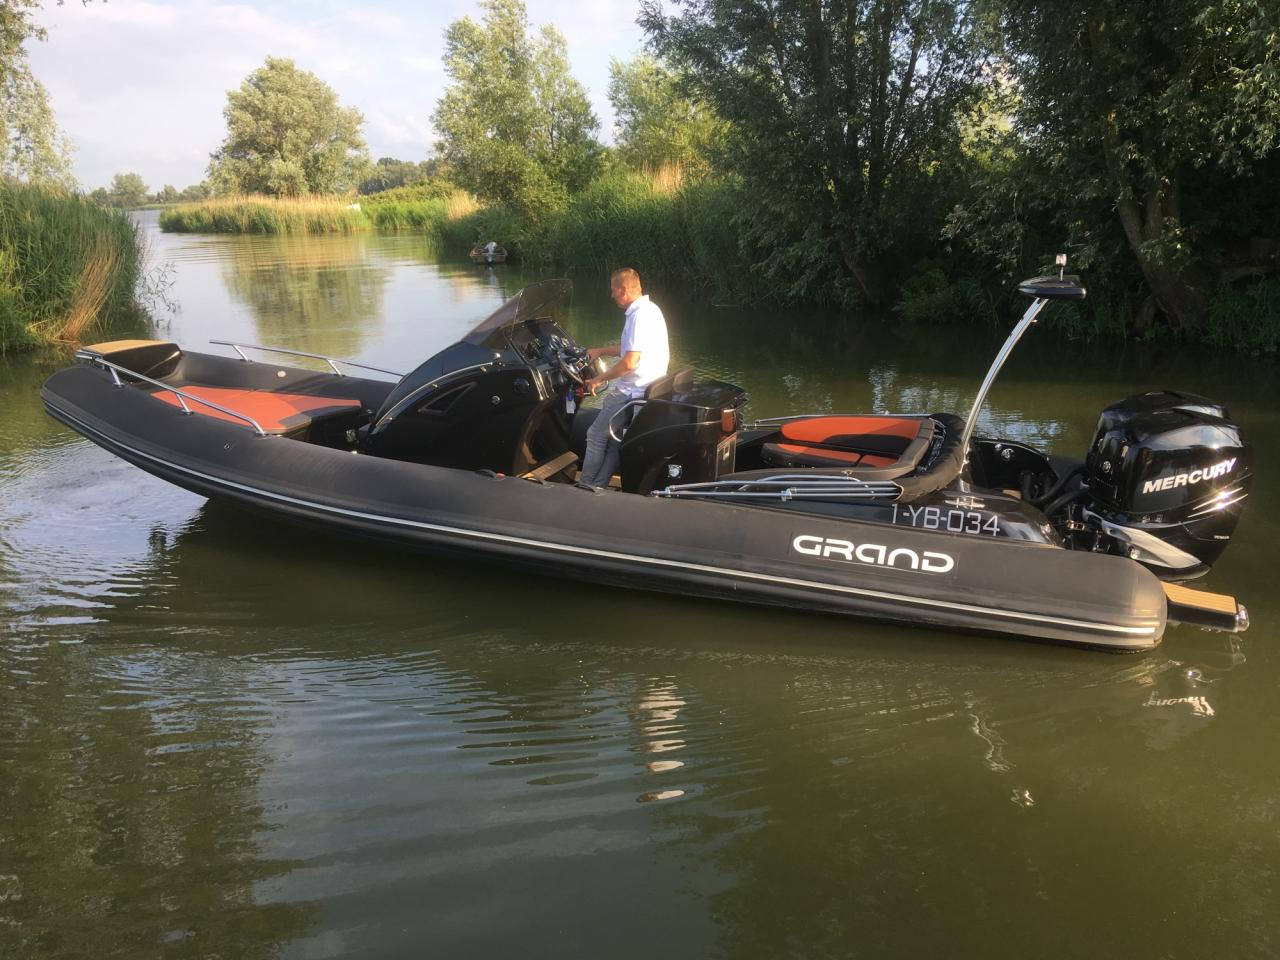 Grand 850 rib met 2x Mercury Verado 225 pk 8